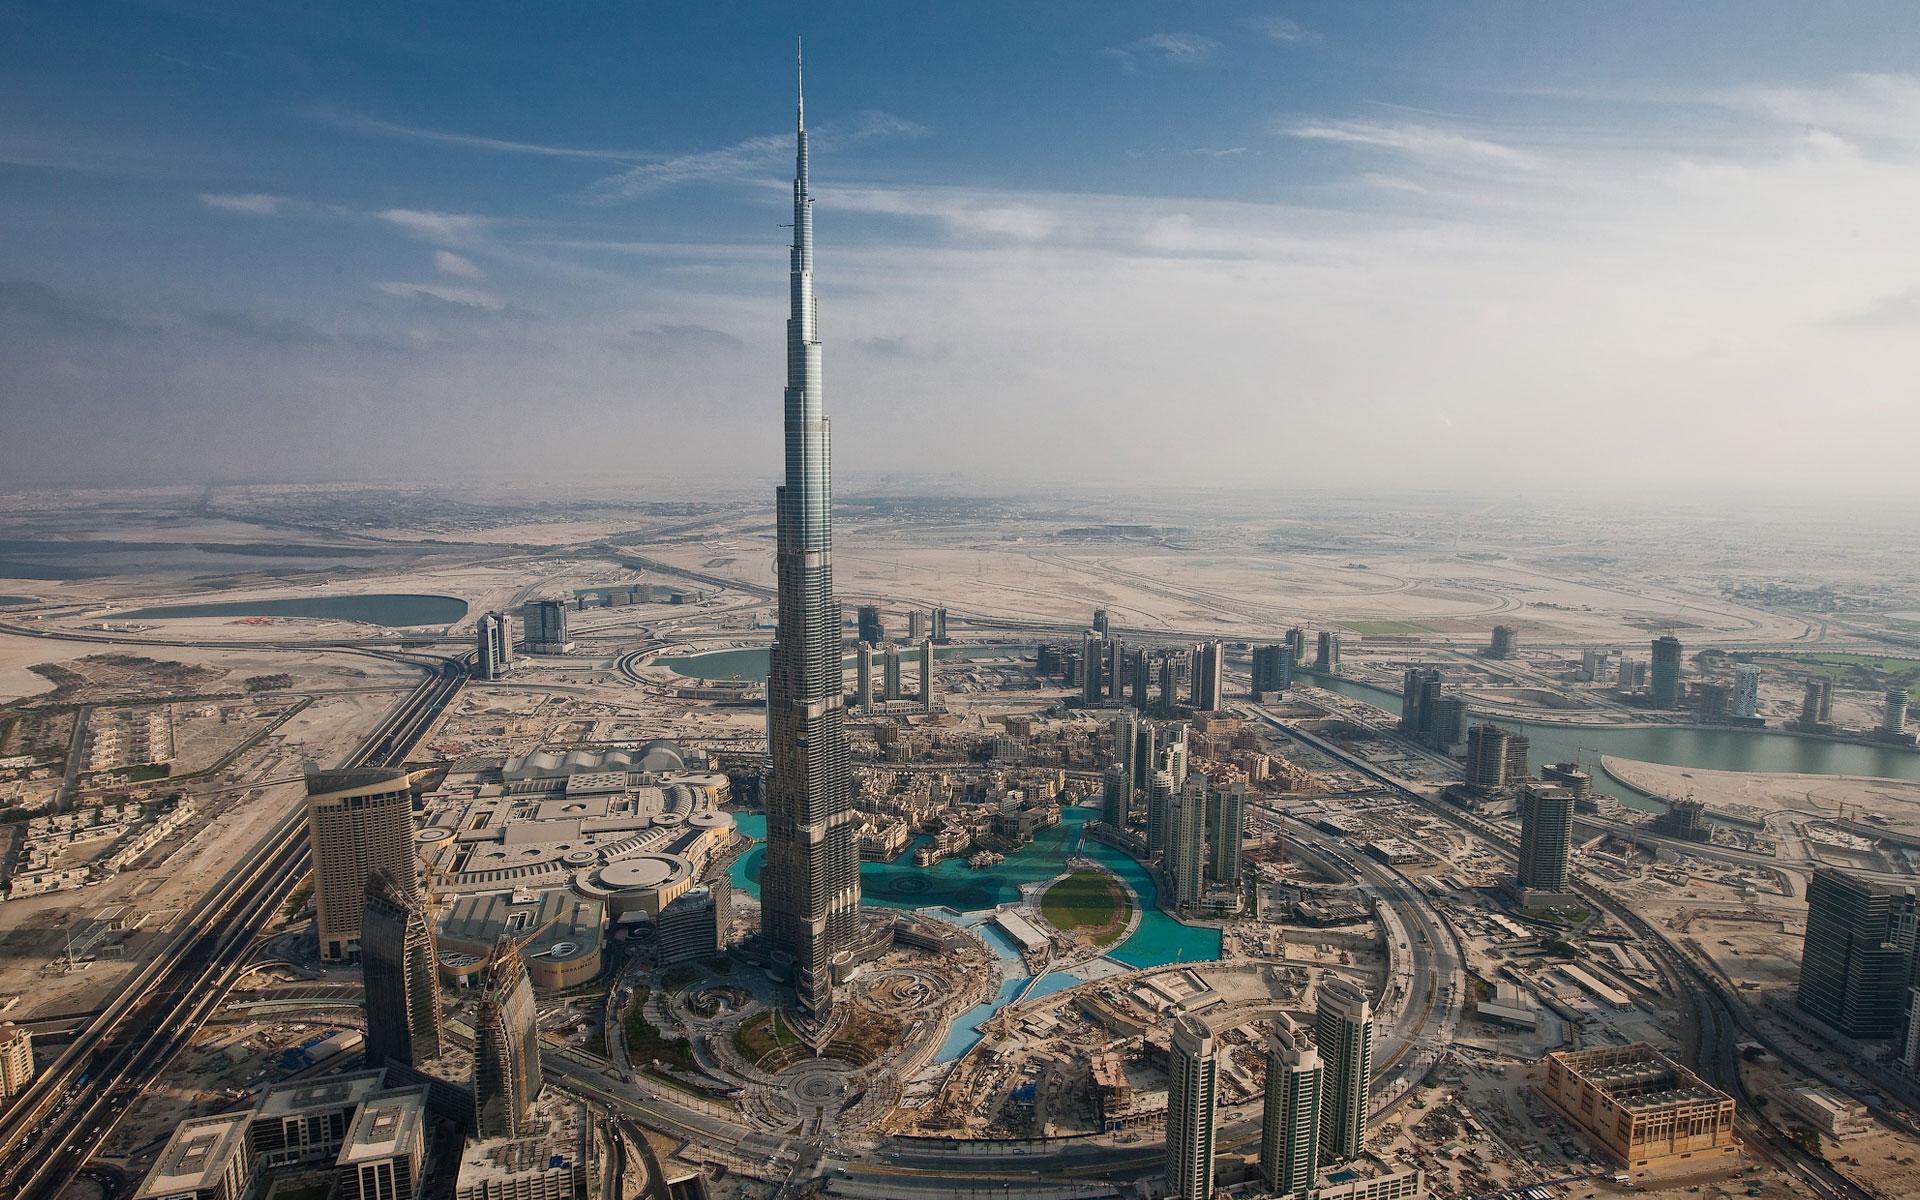 World's Highest Flyby: The Burj Khalifa, The Tallest Building In The World